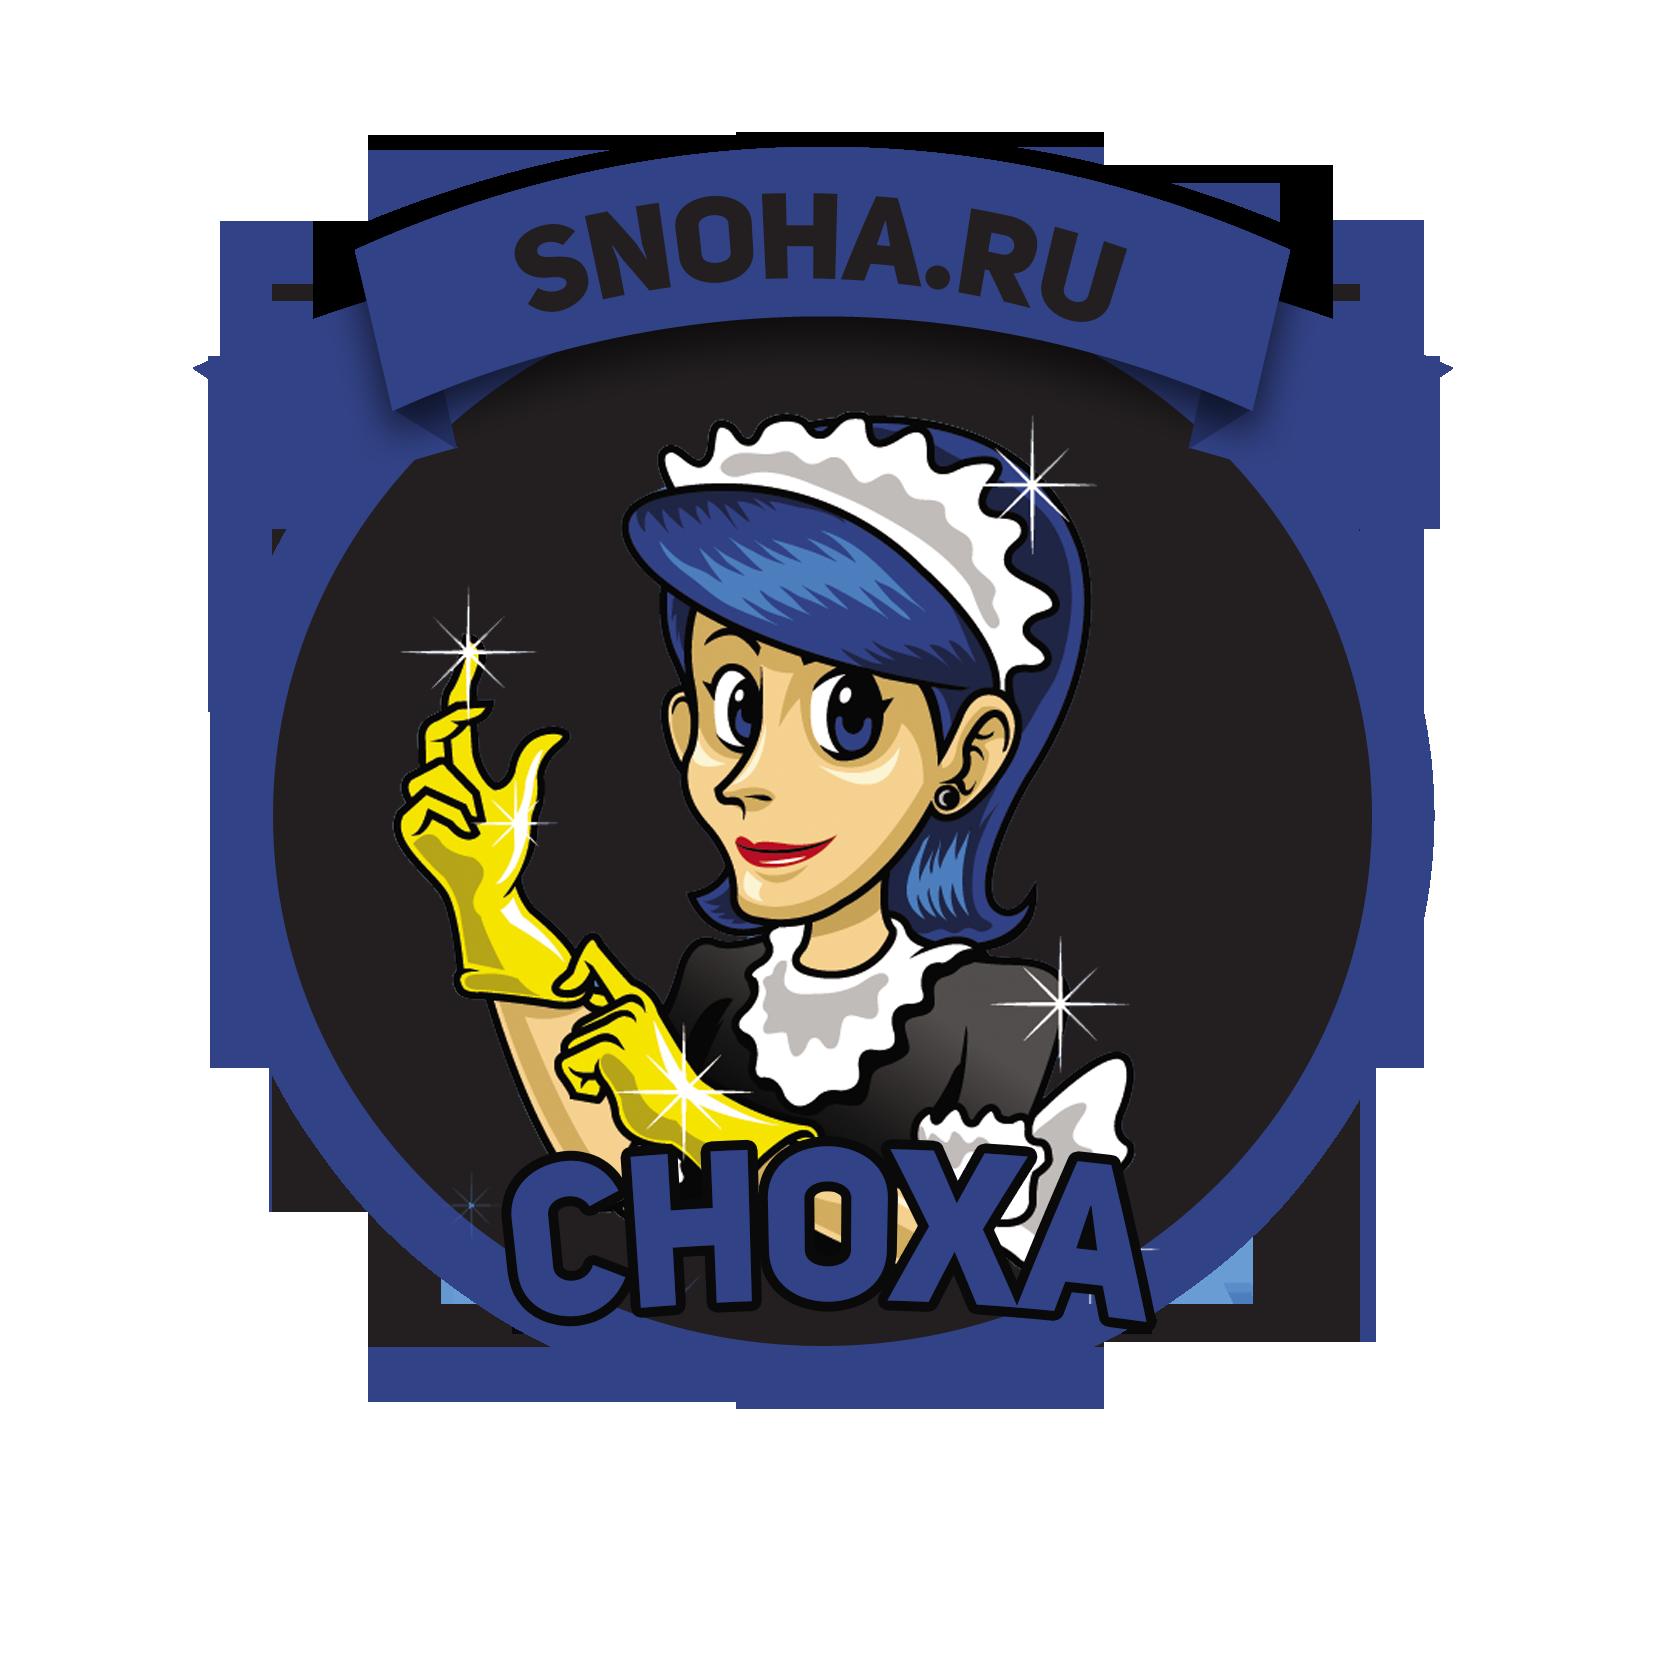 Логотип клининговой компании, сайт snoha.ru фото f_98654a41008949d1.png